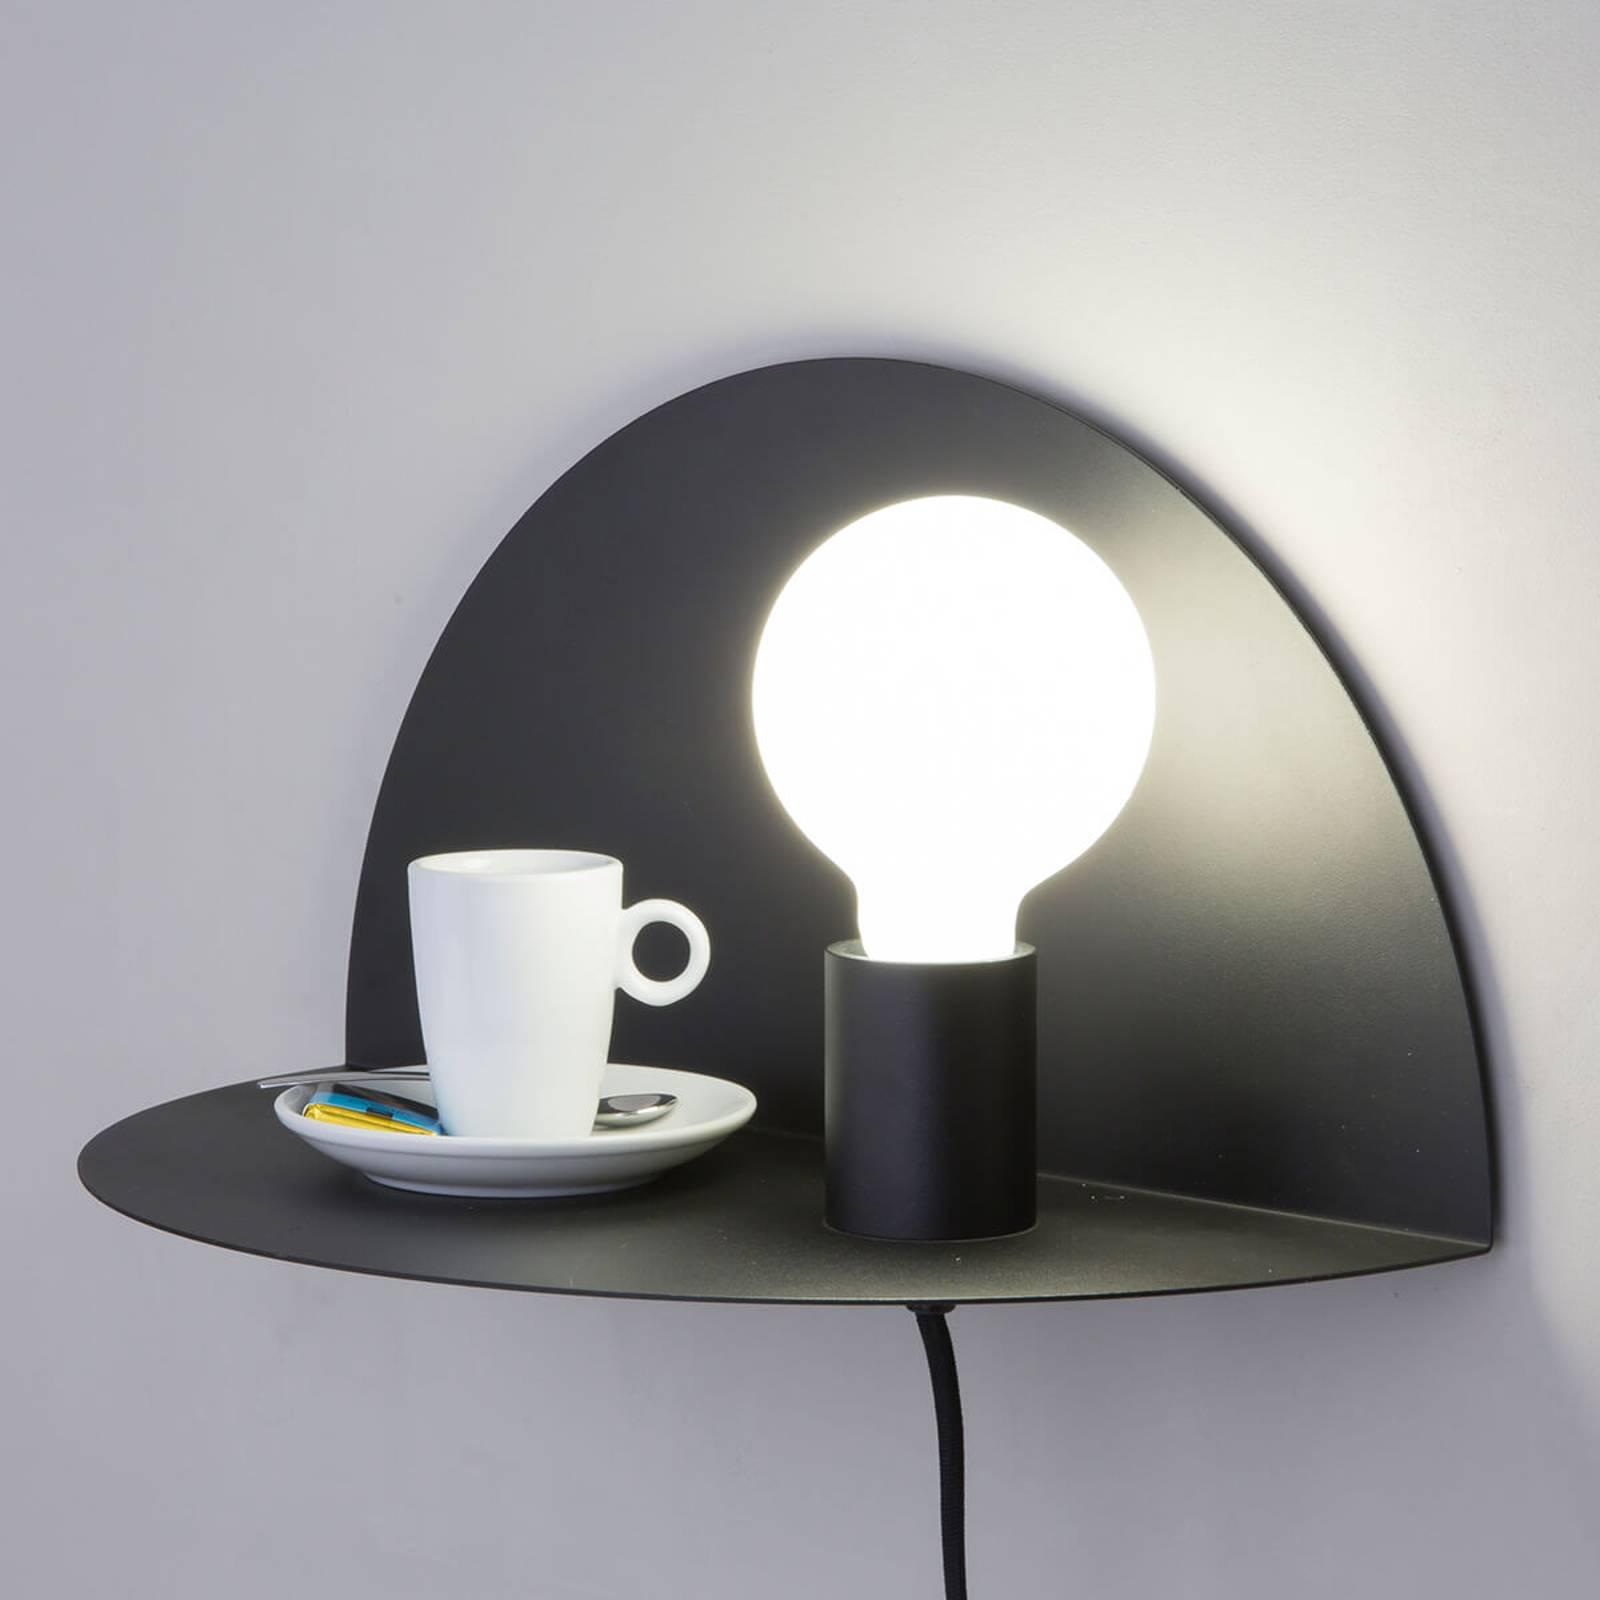 Als nachtkastje bruikbare wandlamp Nit